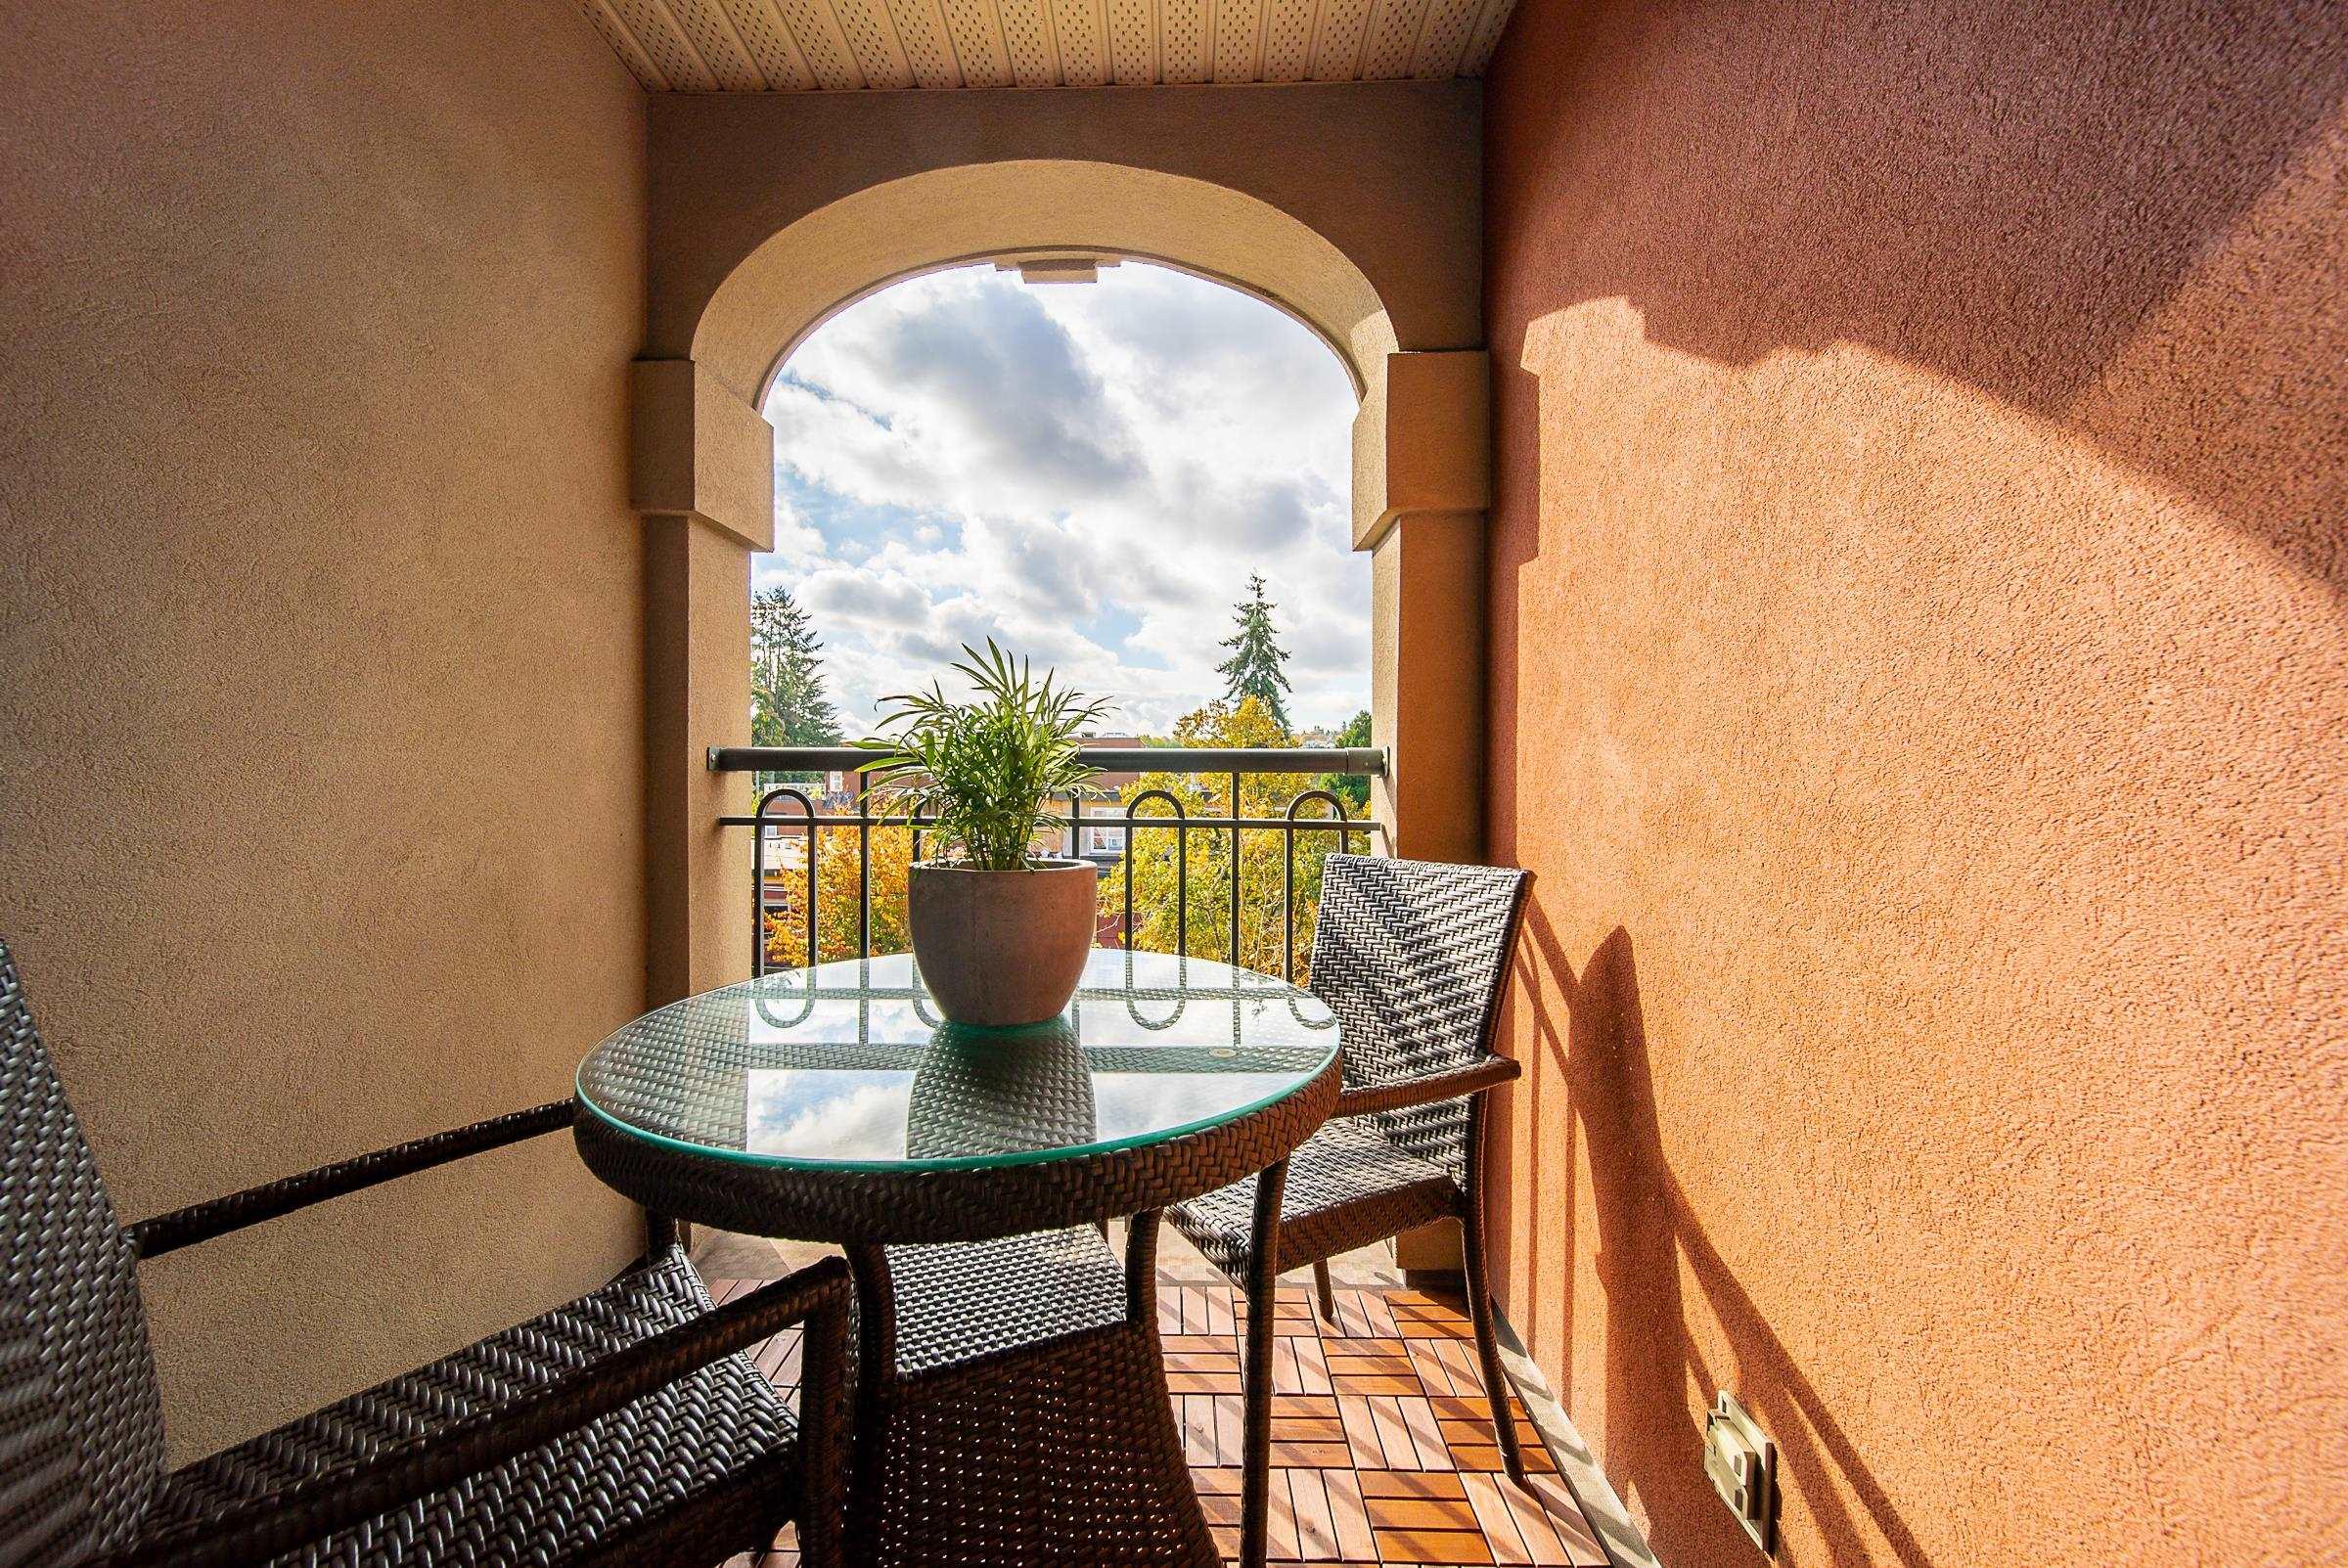 406 1989 DUNBAR STREET - Kitsilano Apartment/Condo for sale, 1 Bedroom (R2624949) - #8